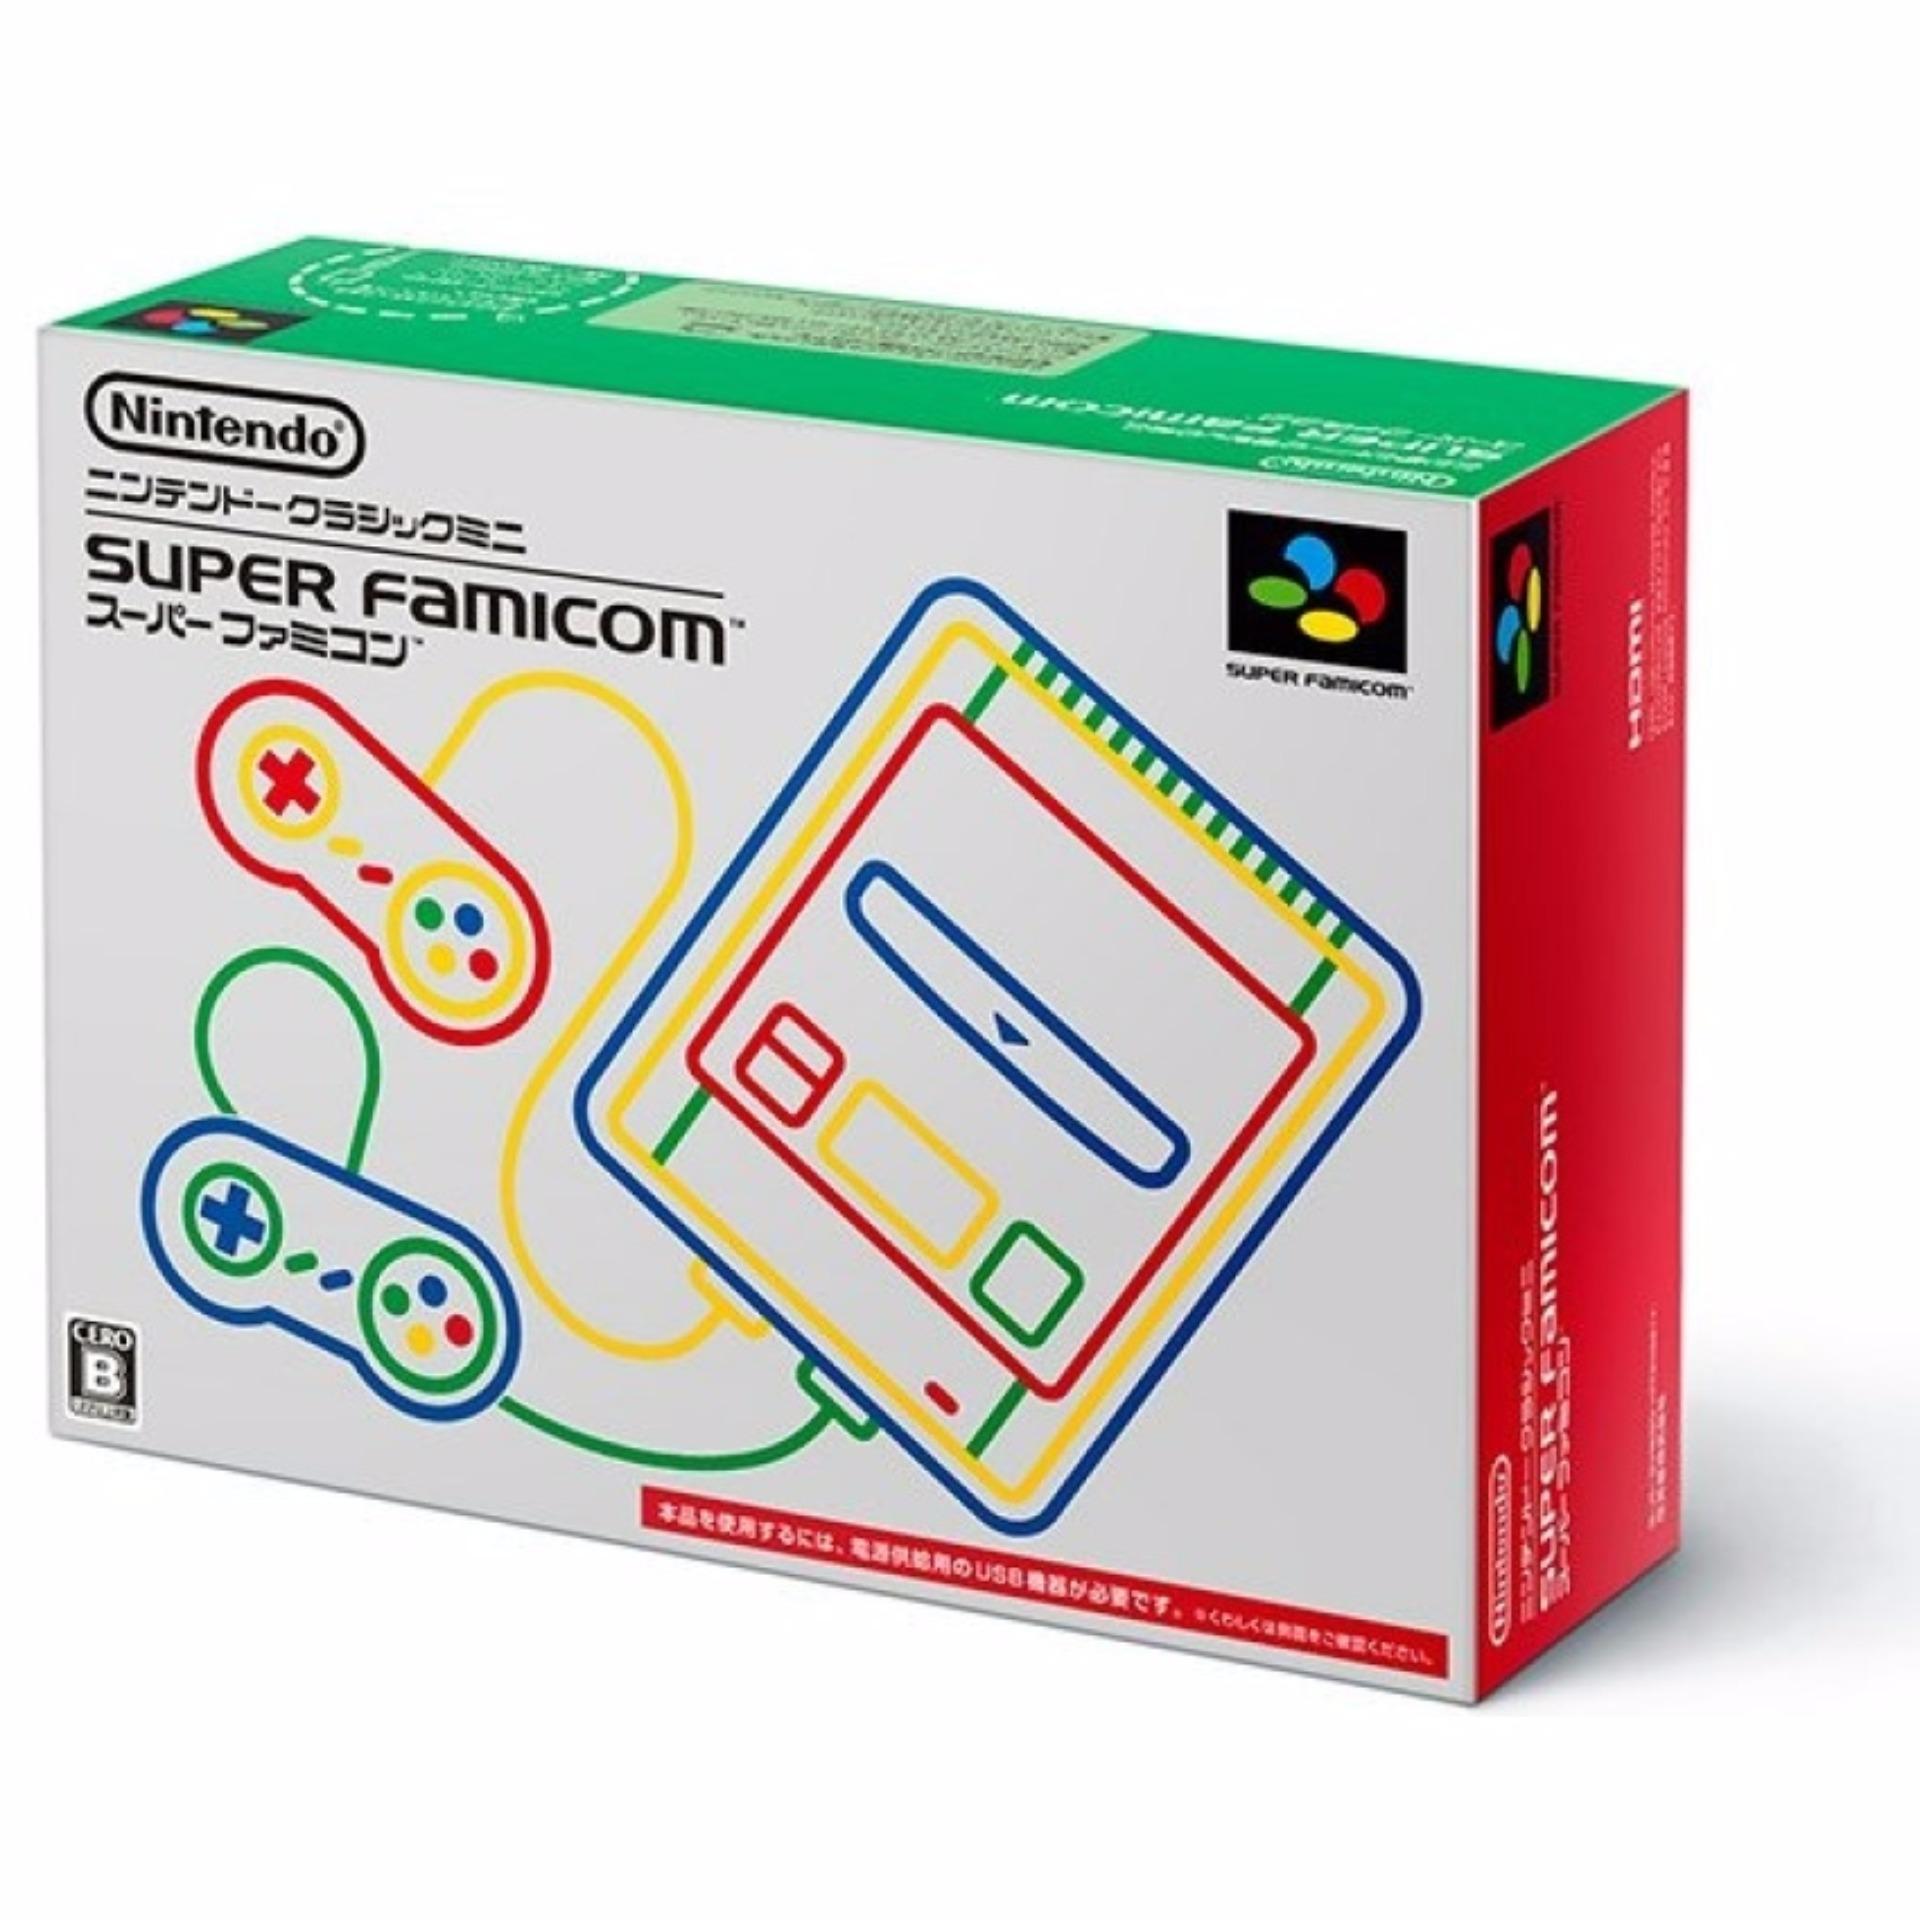 Nintendo Super Famicom Classic Mini (12 Months Warranty)